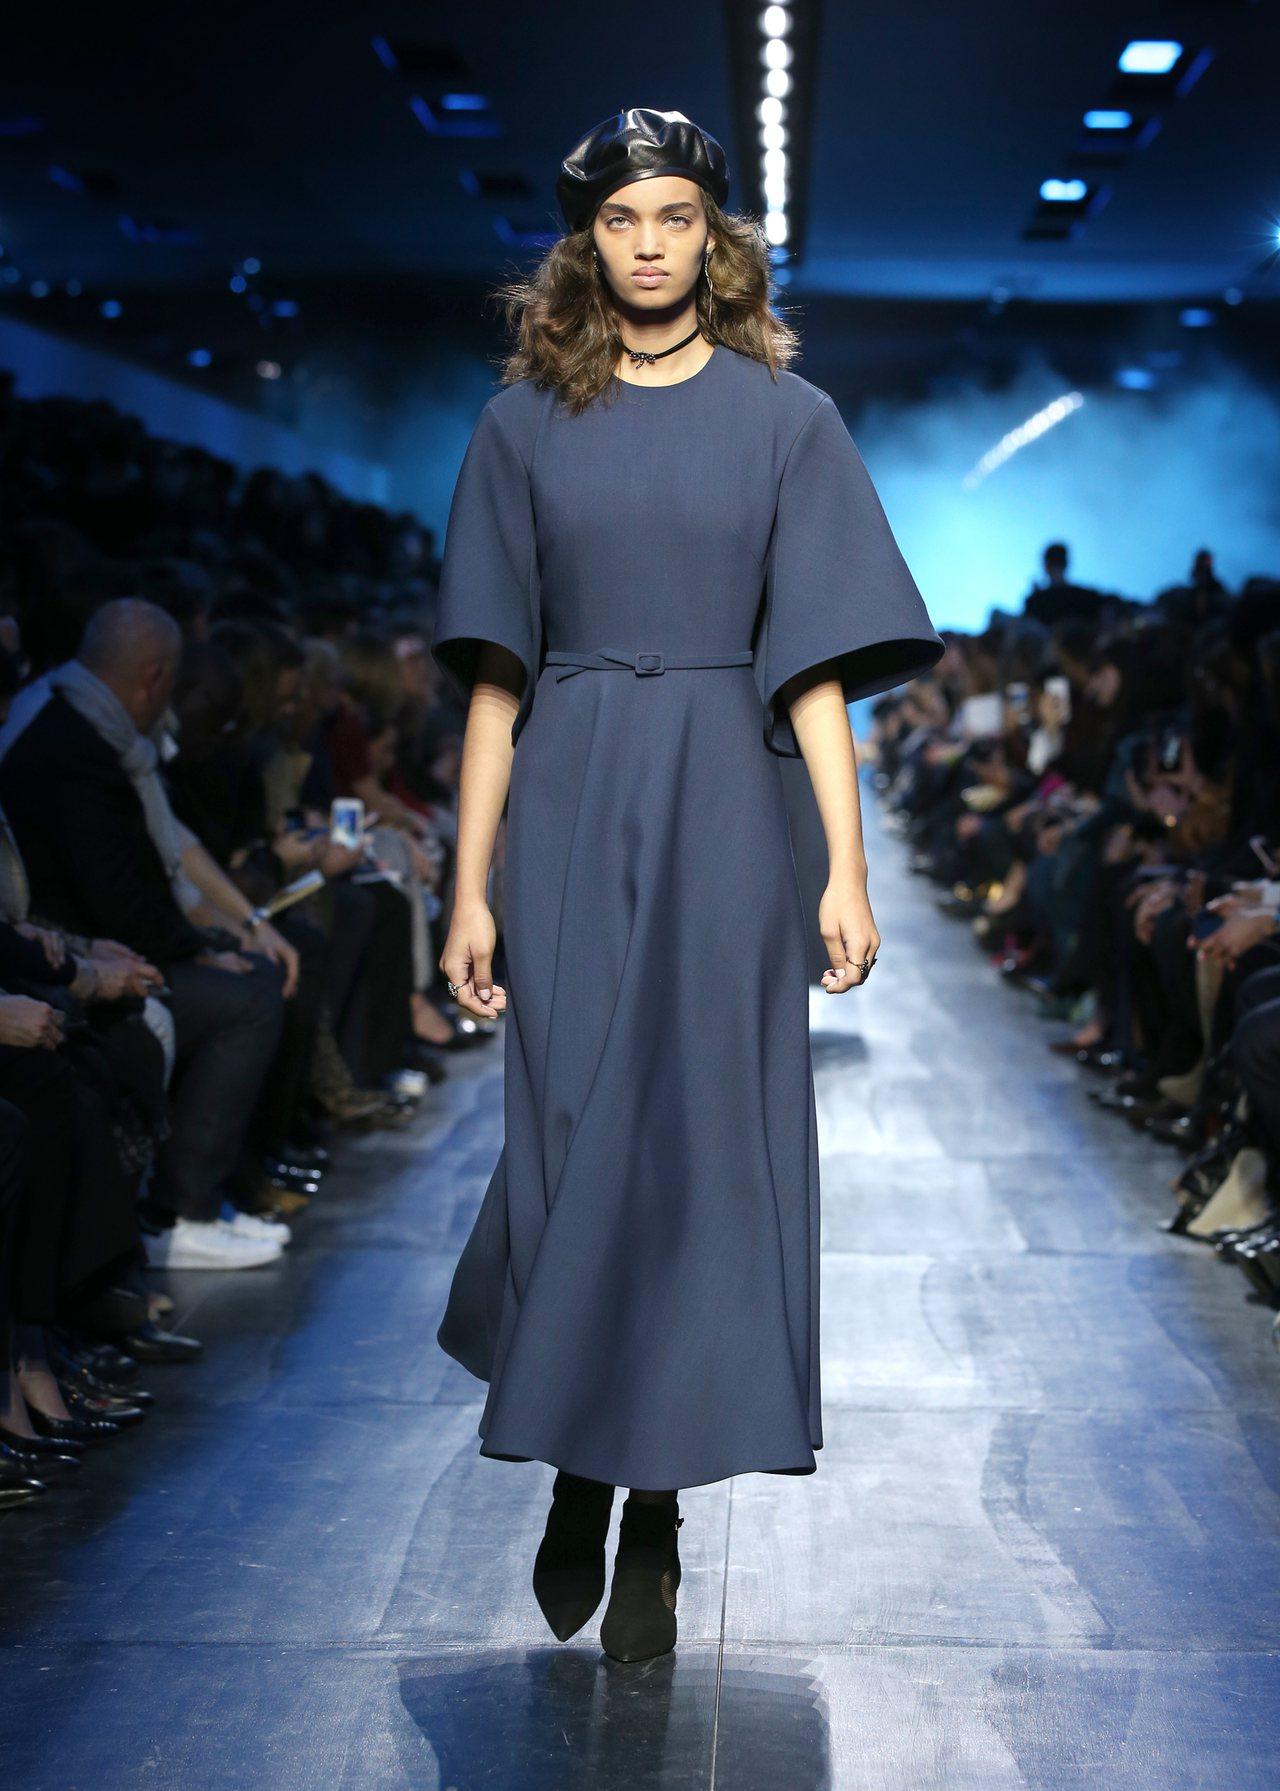 Dior秋冬藍色洋裝的簡潔優雅深受梅蘭妮亞川普喜愛。圖/Dior提供